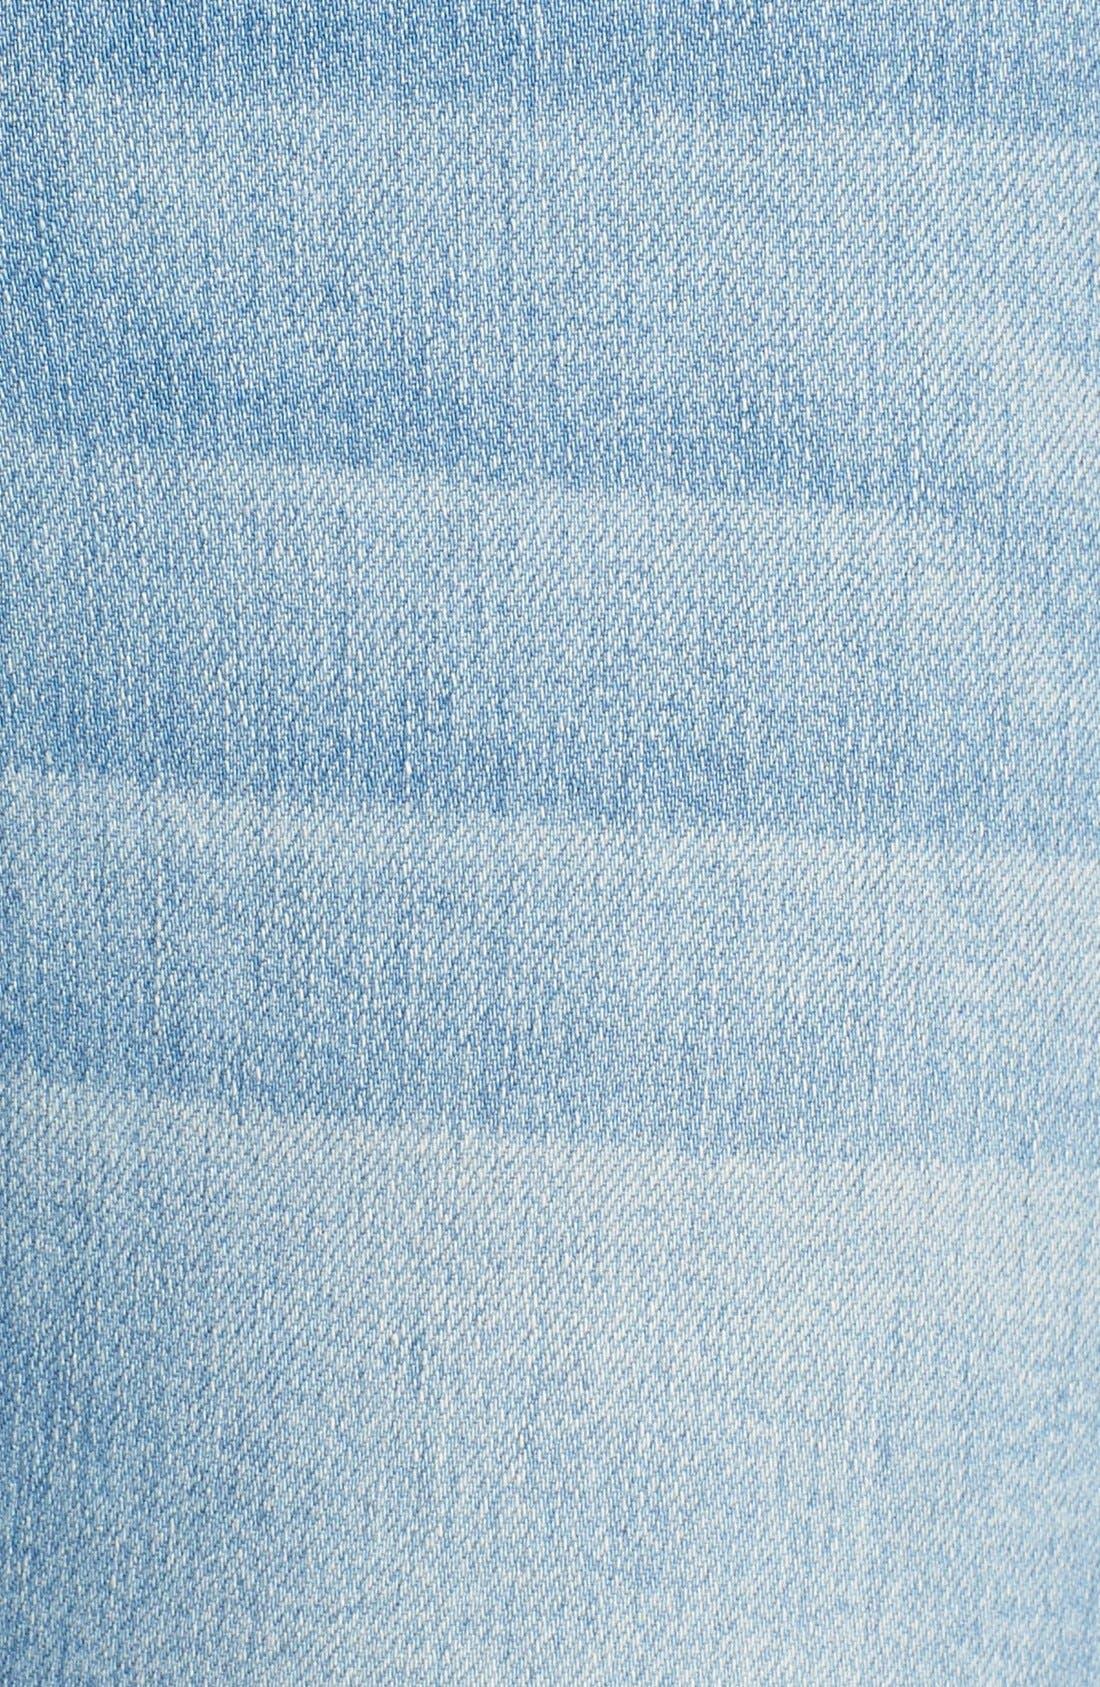 Alternate Image 5  - Cheap Monday 'High Spray' High Rise Skinny Jeans (Stone Bleach)